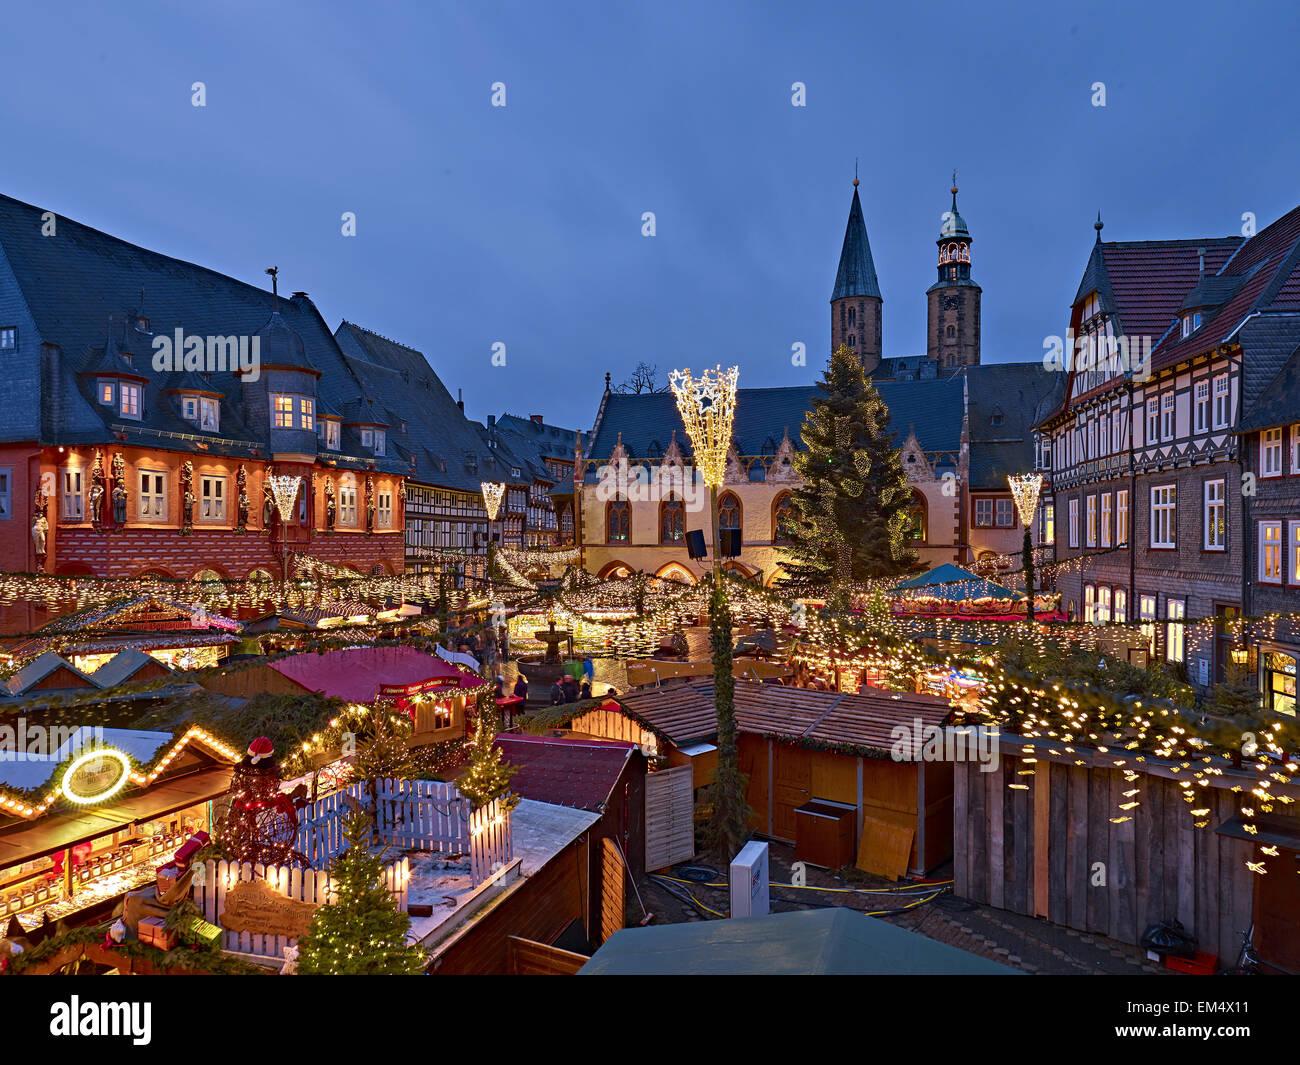 Goslar Christmas Market 2021 Christmas Market In Goslar Germany Stock Photo Alamy